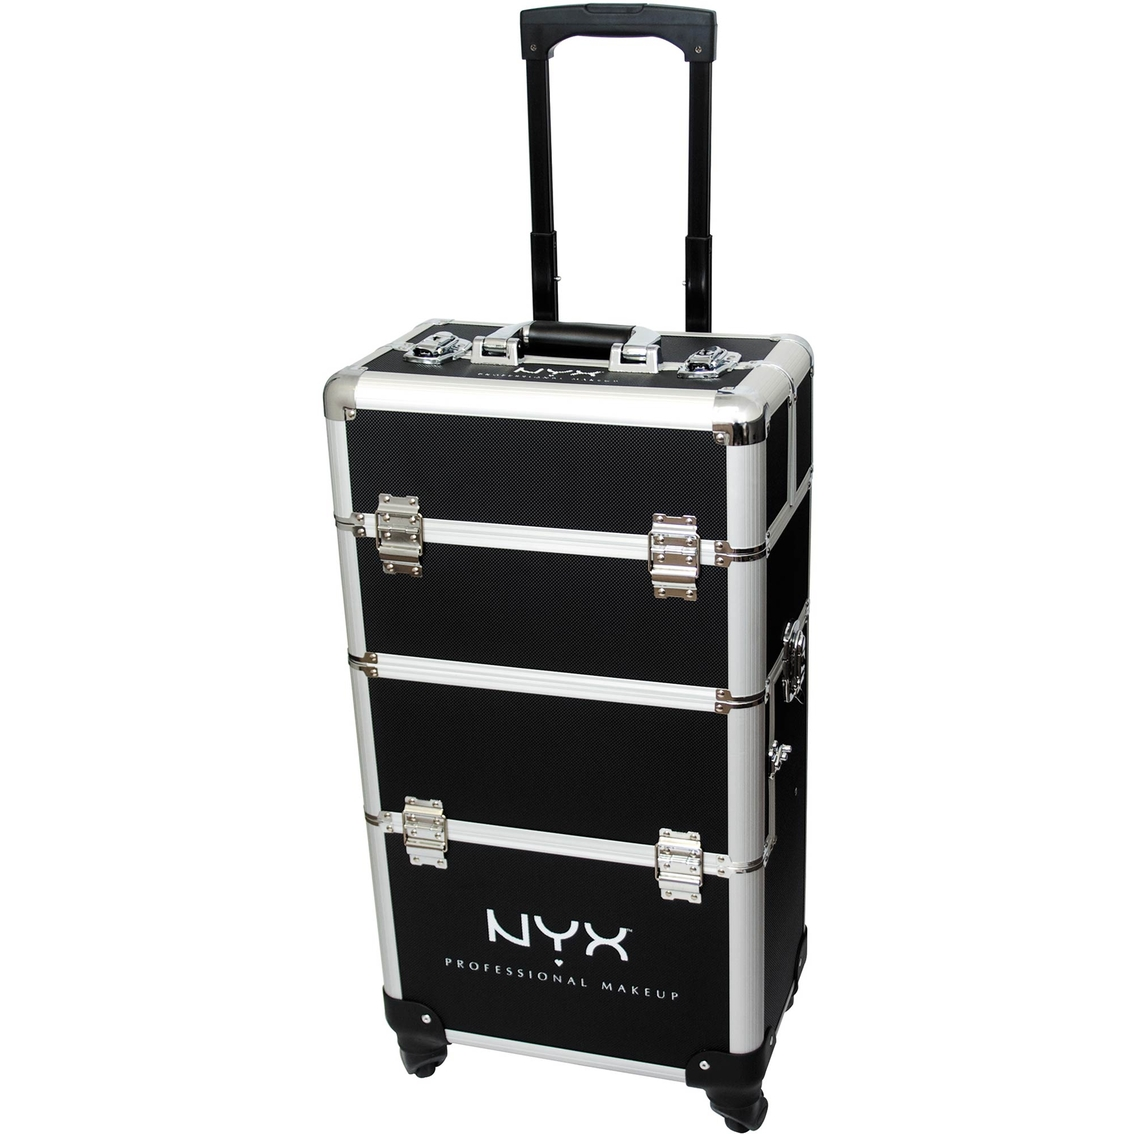 nyx makeup artist 4 tier train case makeup cases beauty health shop the exchange. Black Bedroom Furniture Sets. Home Design Ideas